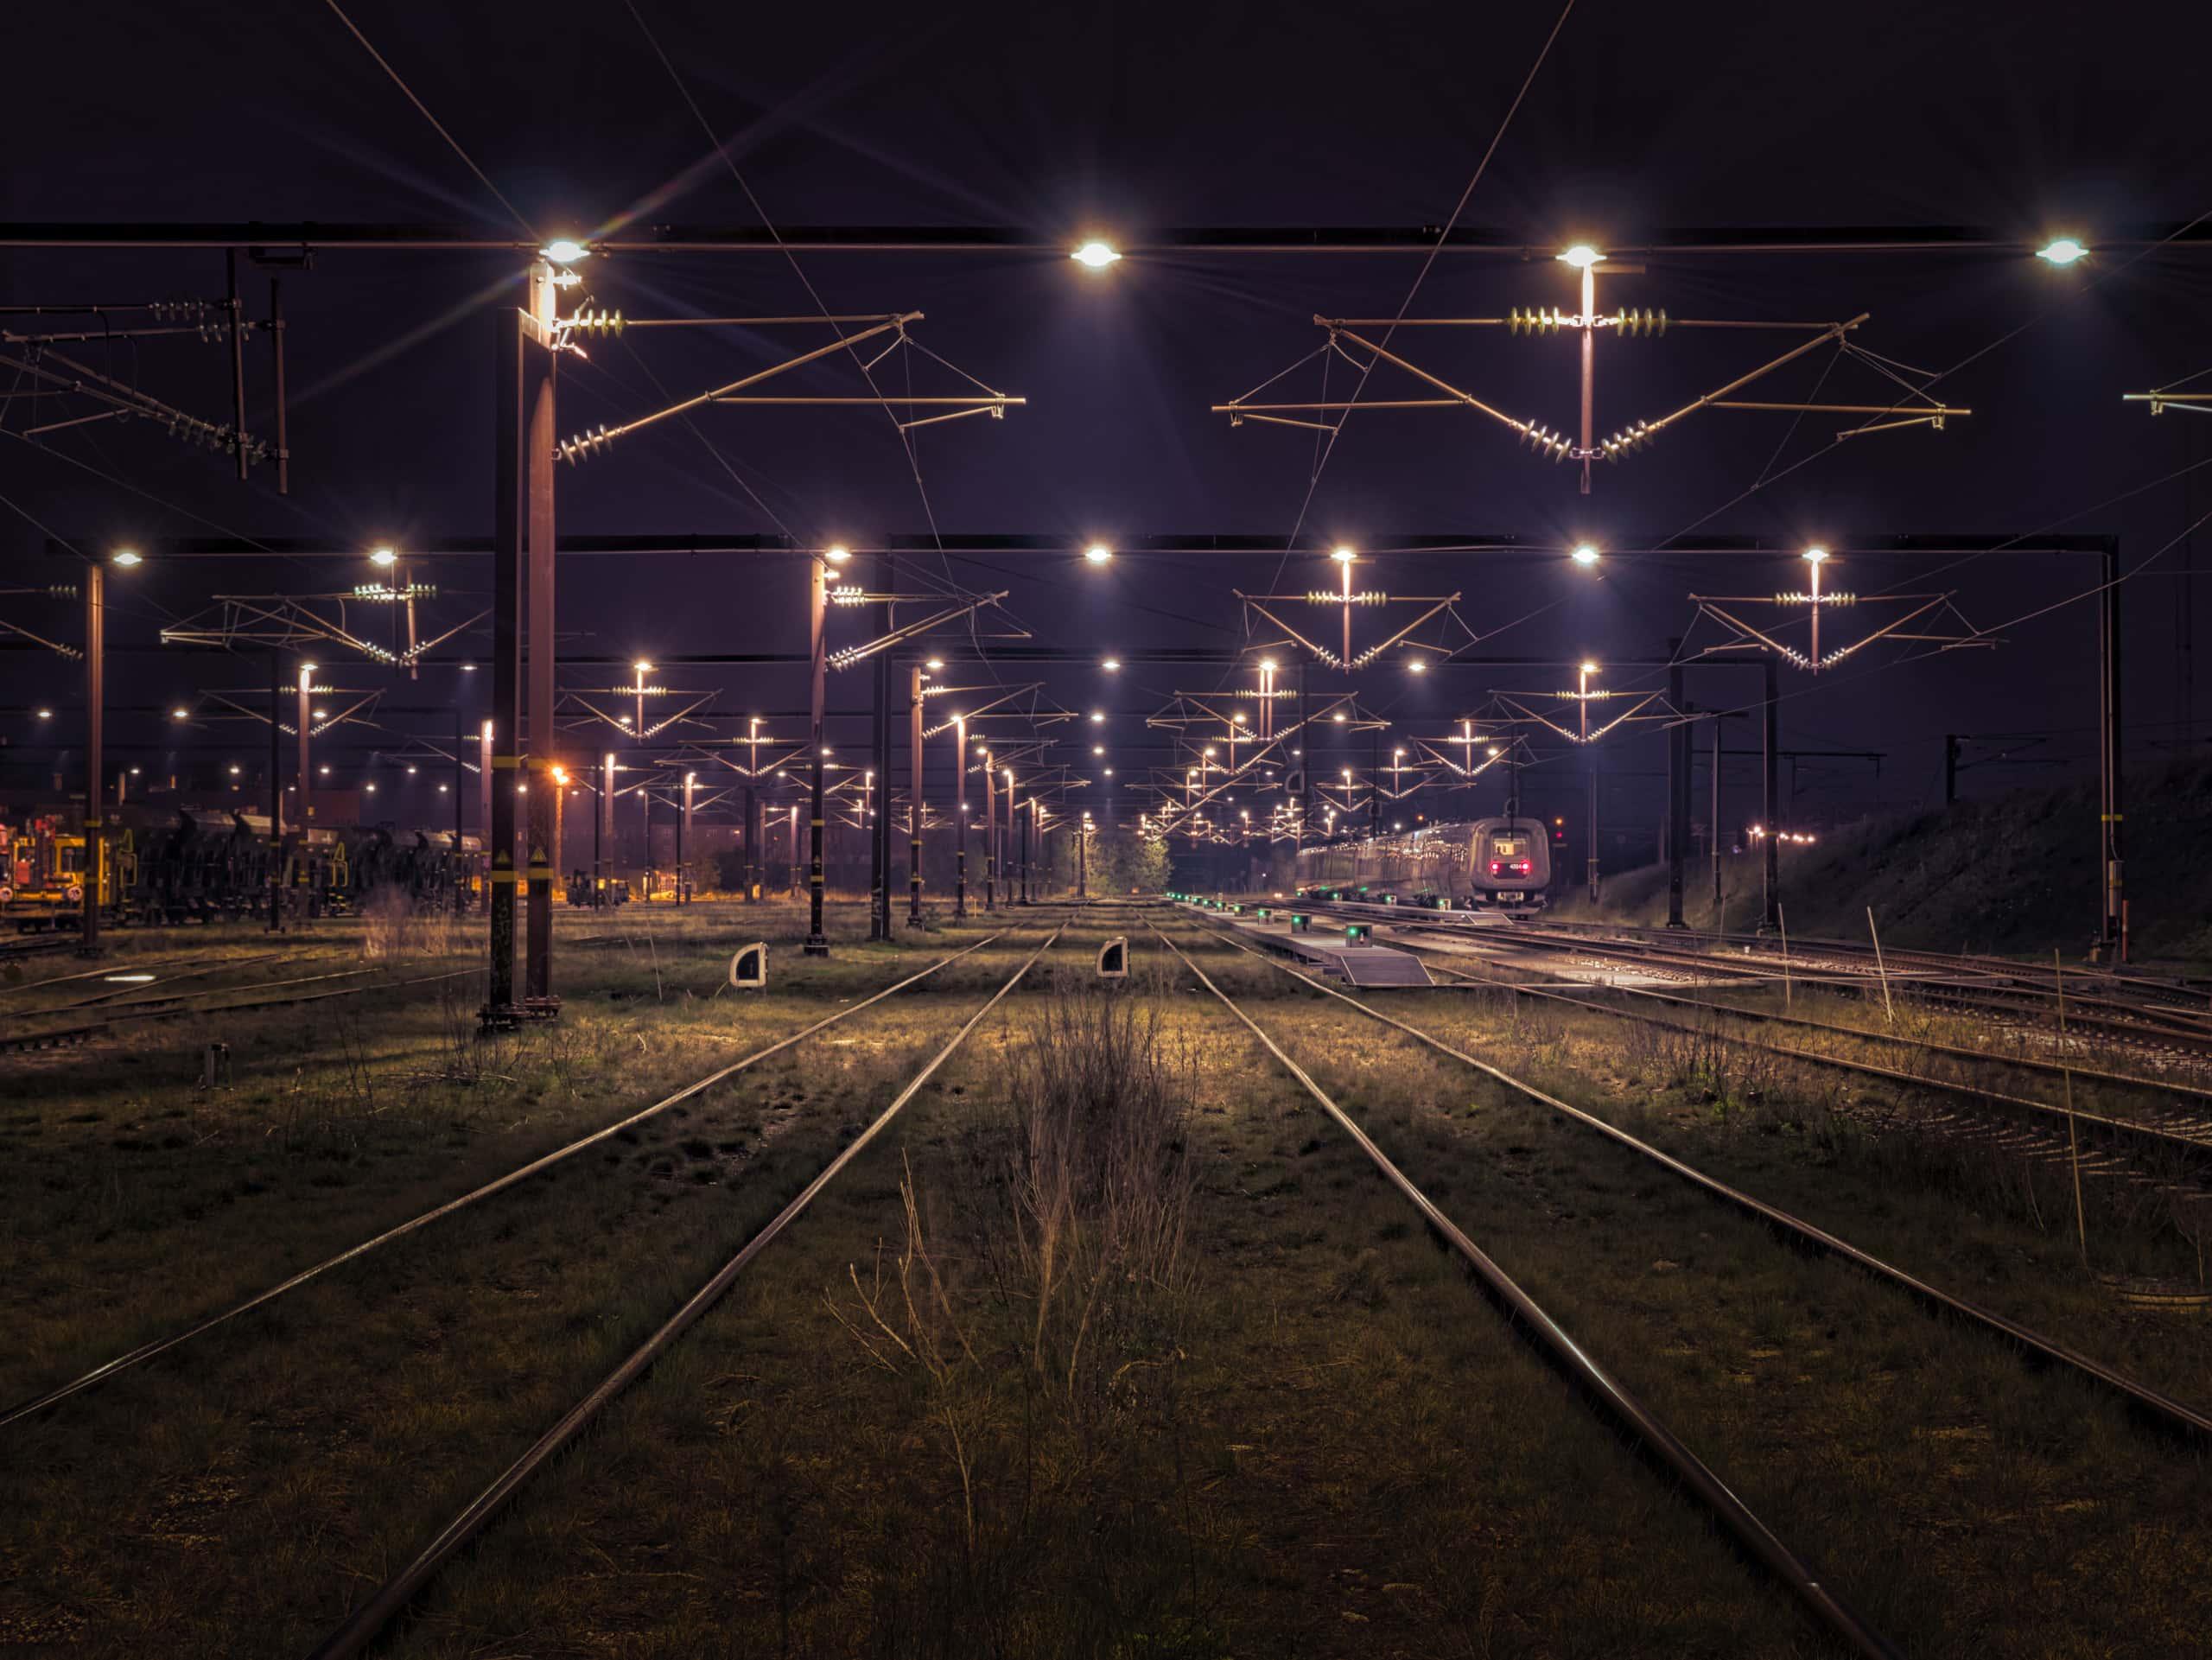 UrbEx: Urban Exploration